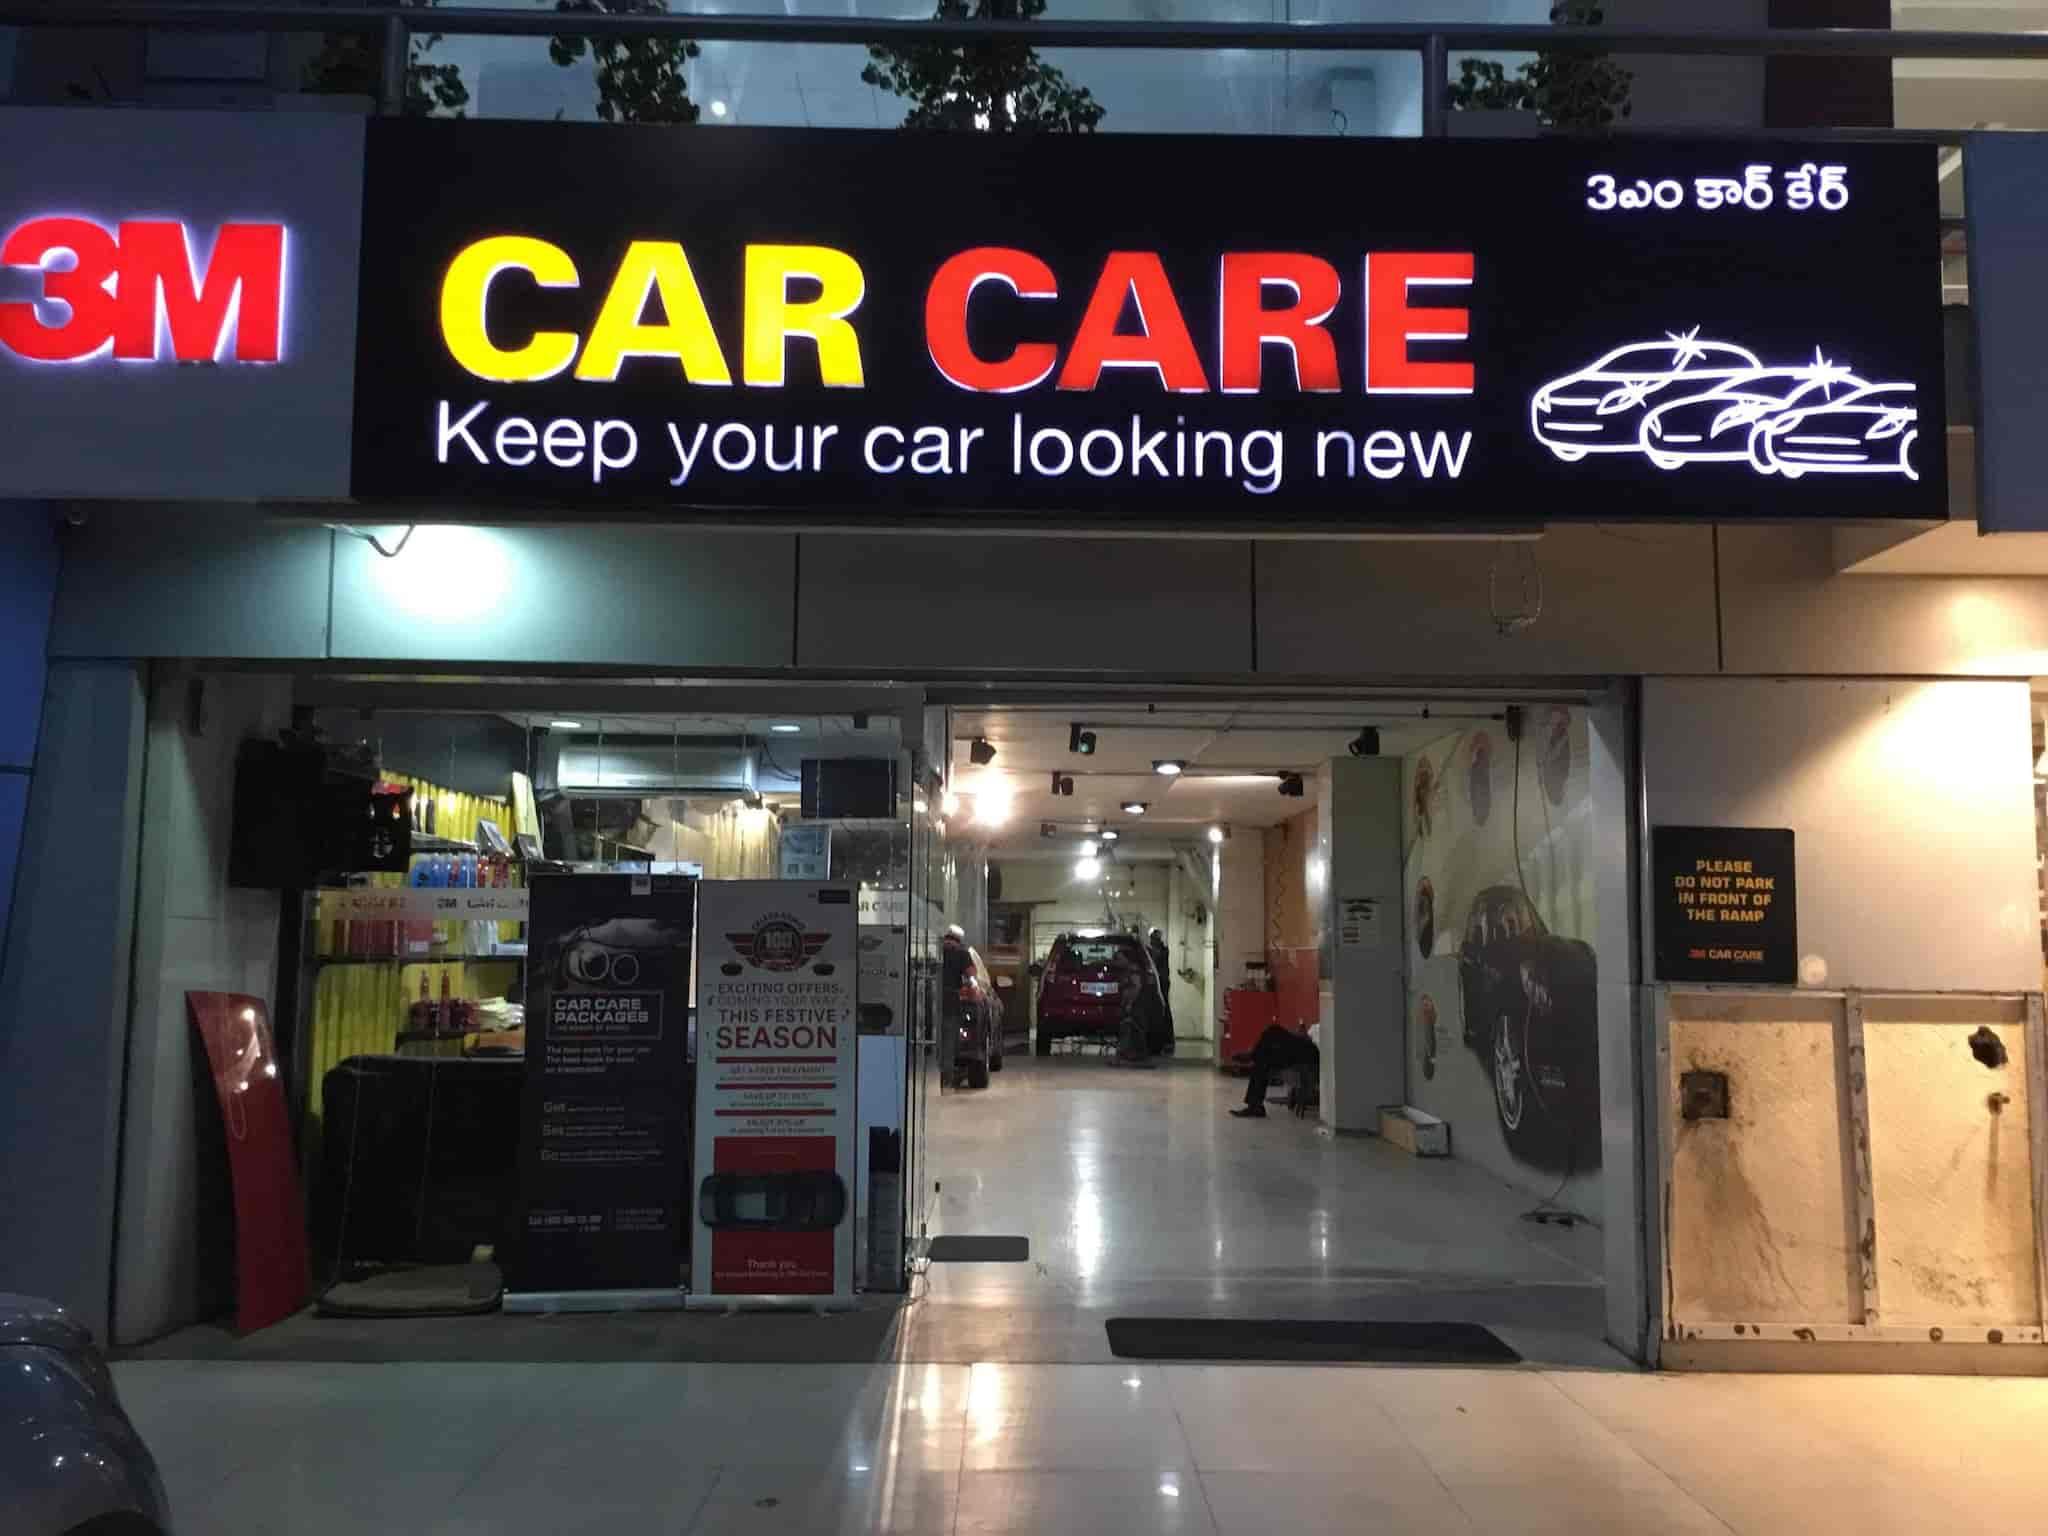 3m Car Care Banjara Hills Car Washing Services In Hyderabad